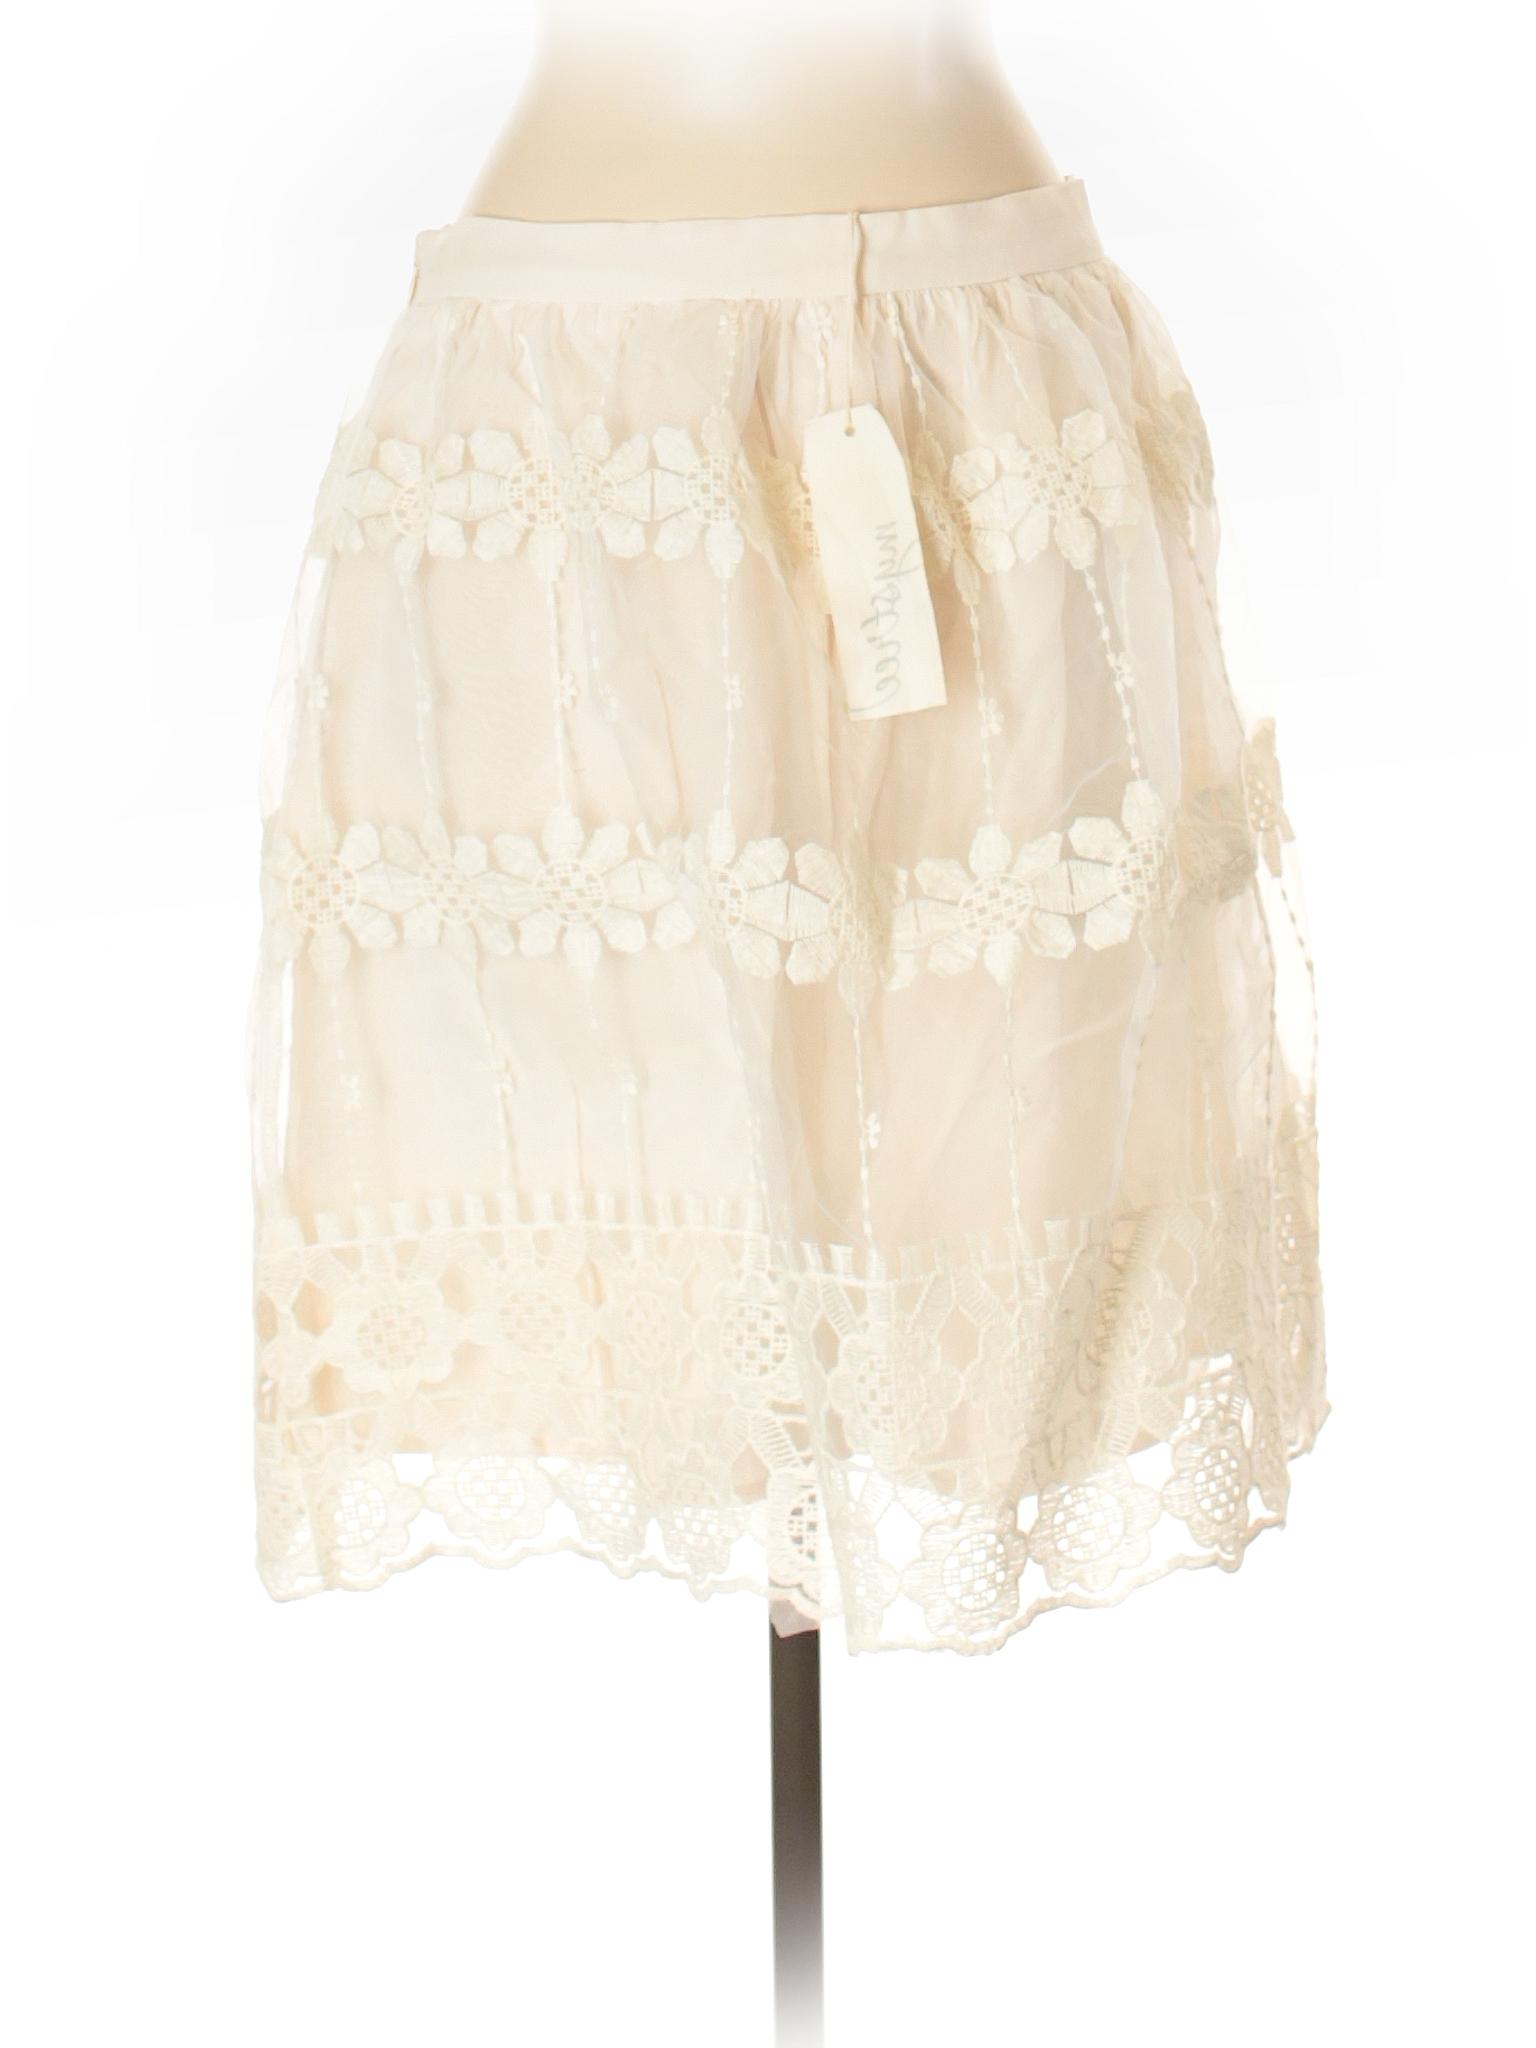 Formal Formal Skirt Mystree Leisure winter Skirt Mystree Leisure Leisure Formal winter winter Mystree C6qXww